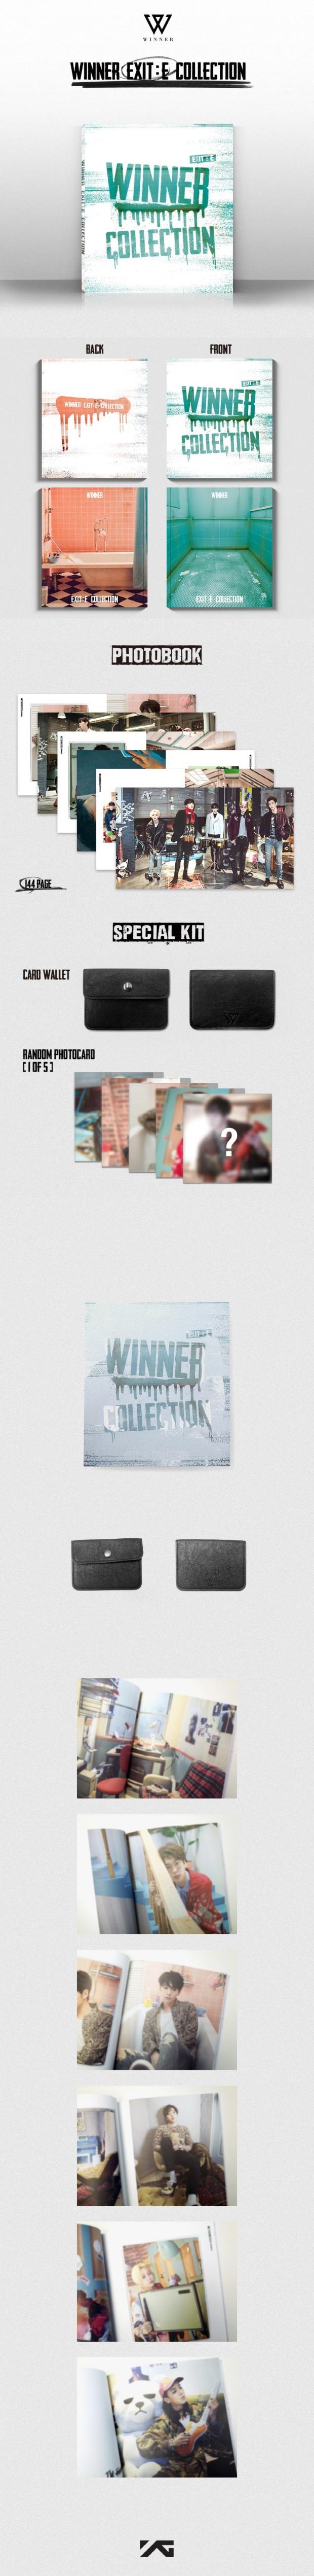 winner_photobook_01